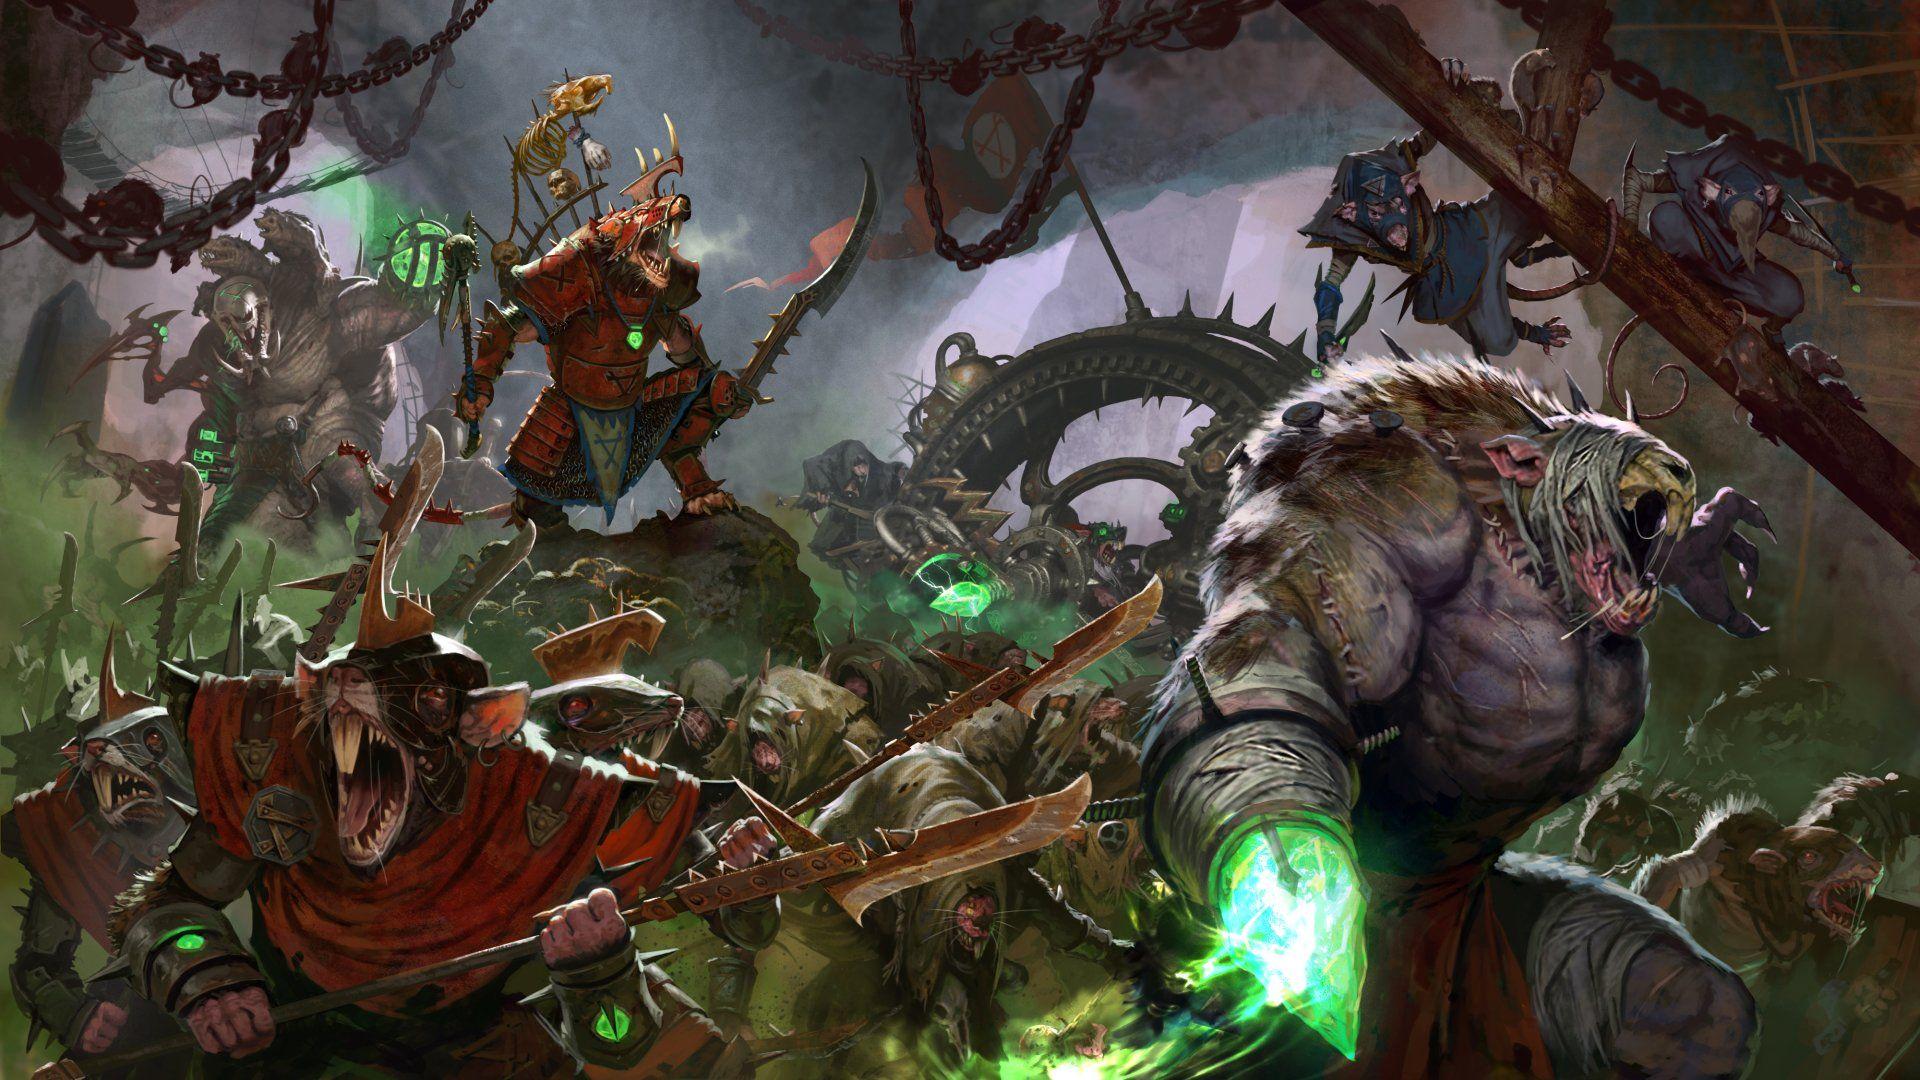 Video Game Total War Warhammer Ii Warrior Creature Rat